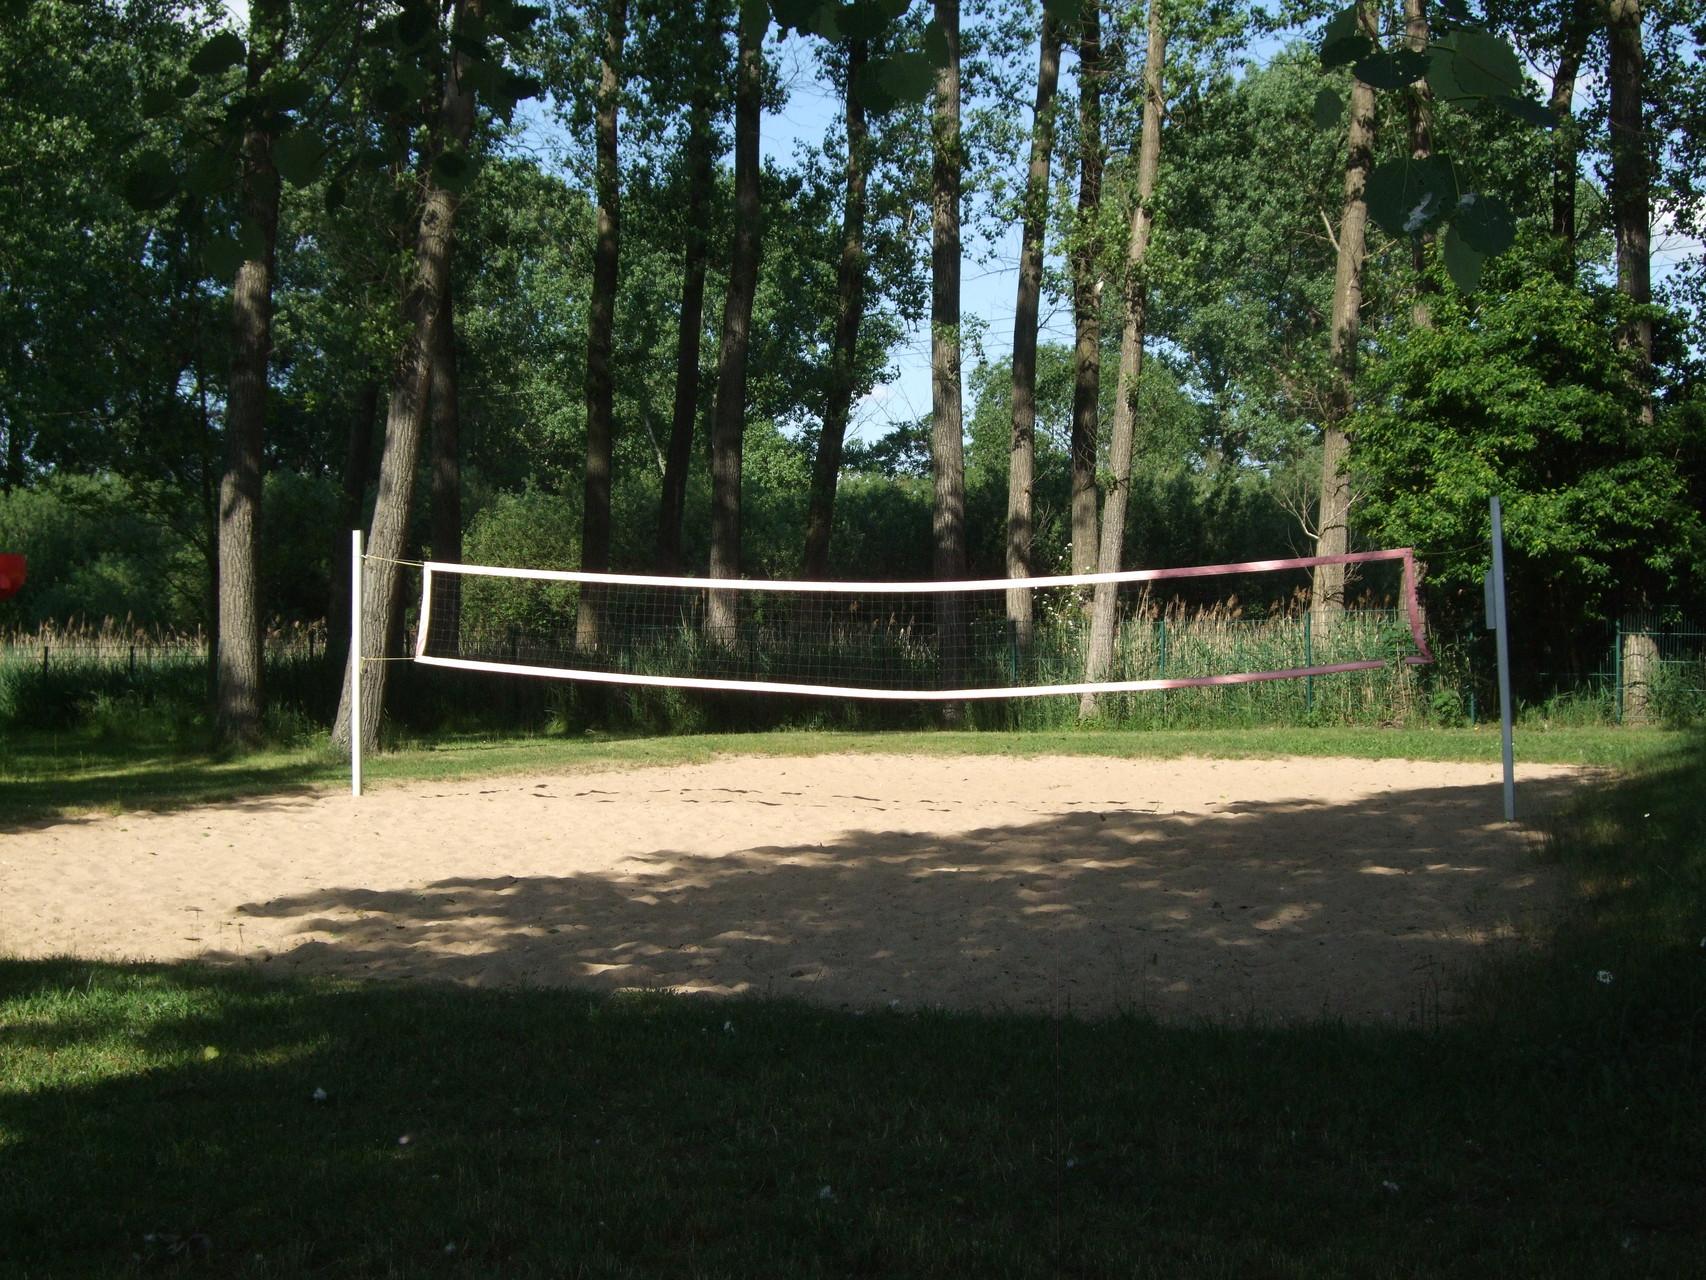 Volleyballplatz im Naturbad